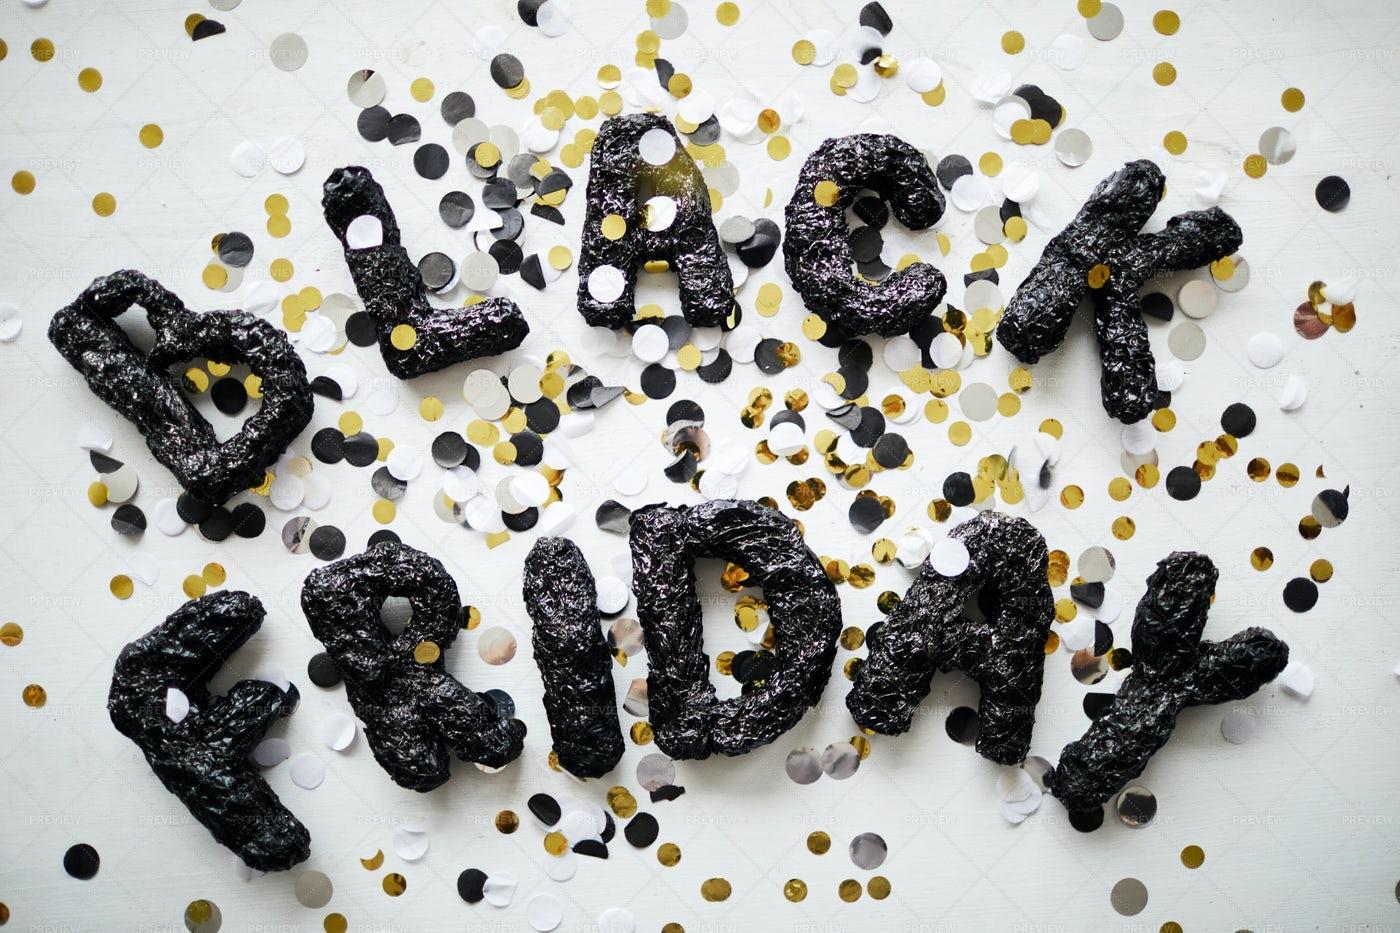 Black Friday Art: Stock Photos